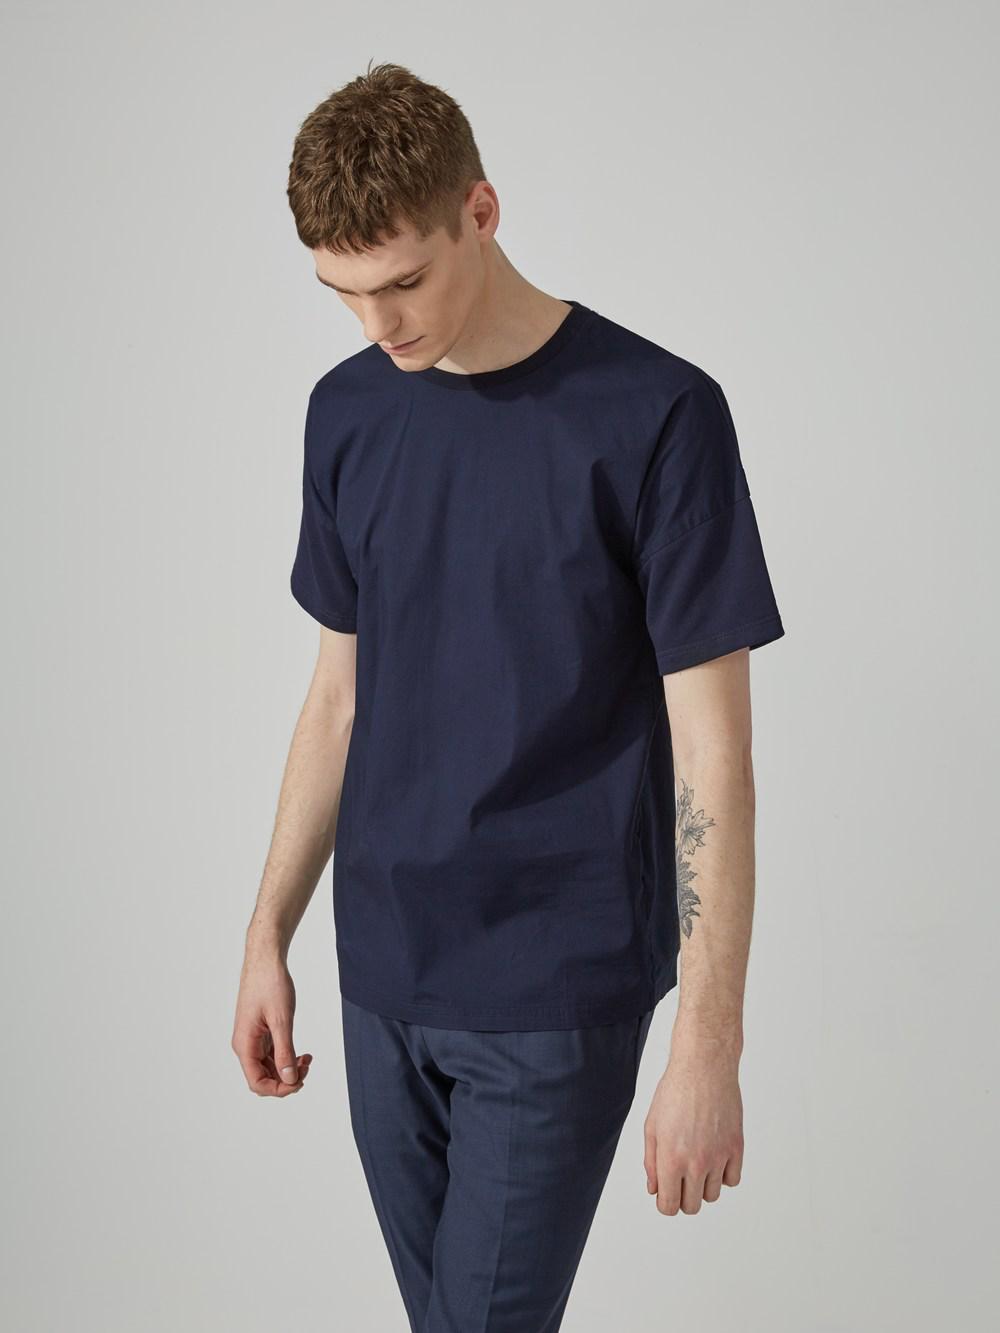 Frank + Oak Oversized Kimono Sleeve T-Shirt In Navy